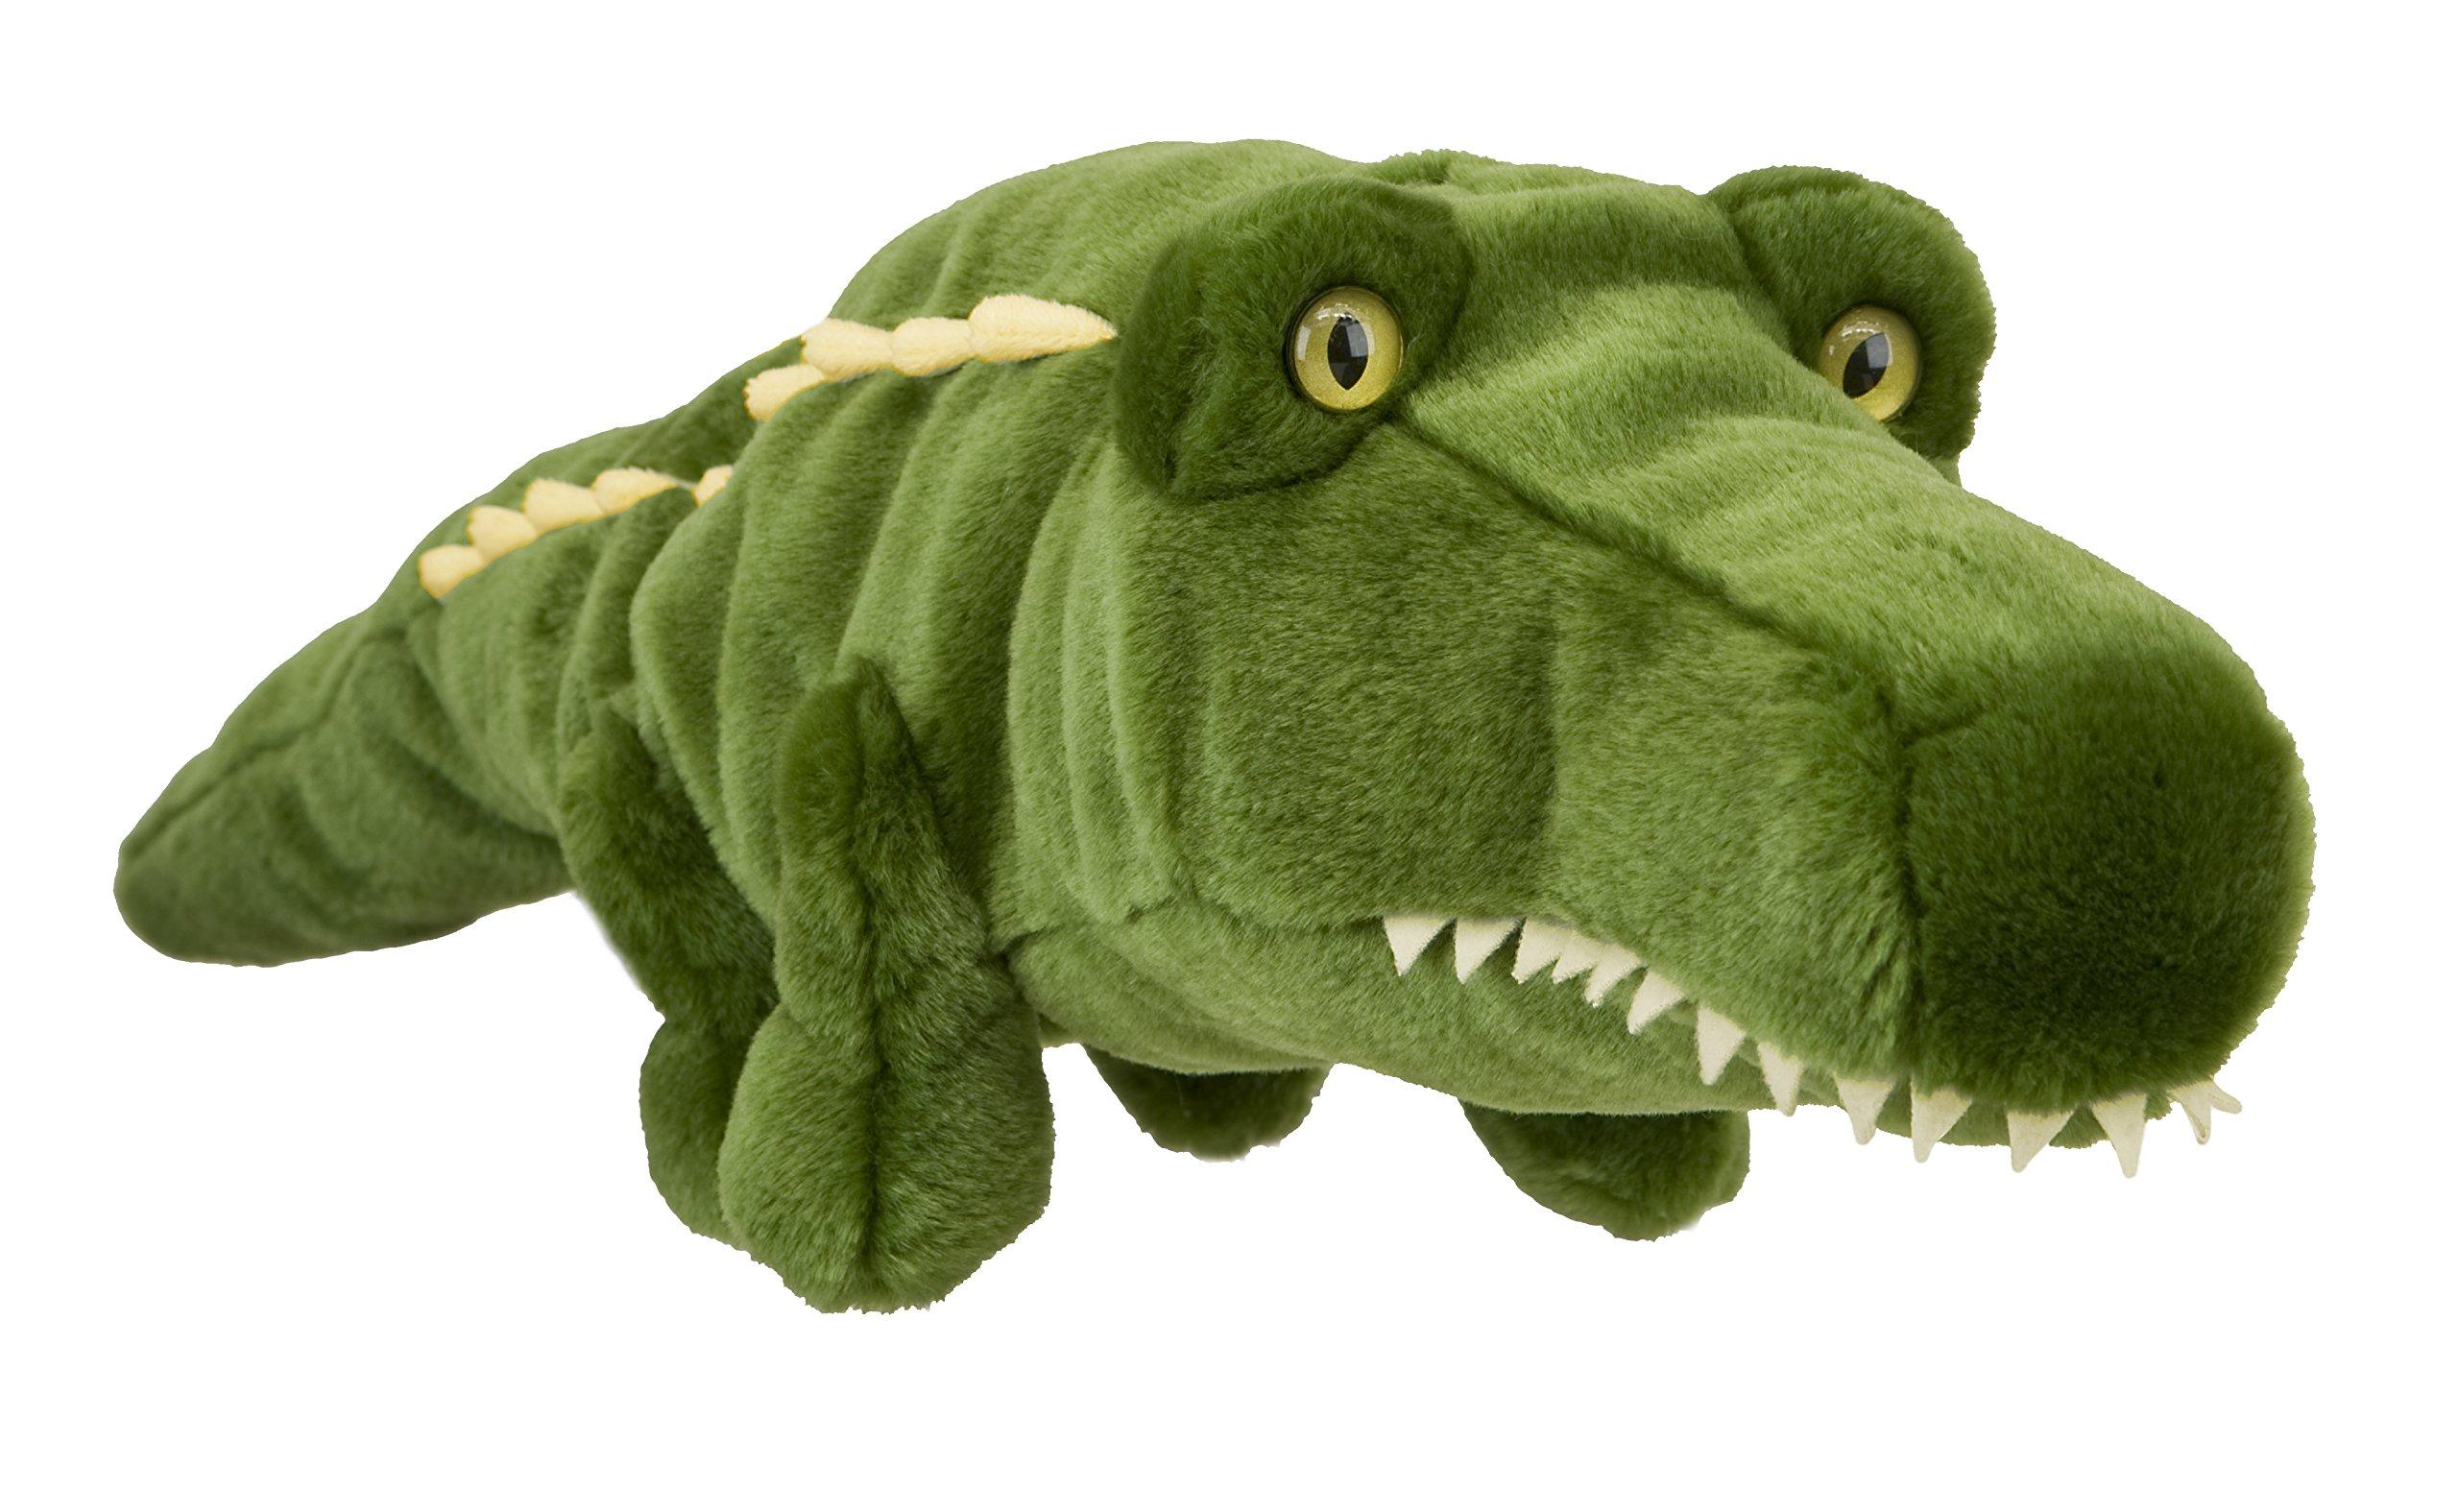 Oversized Alligator Crocodile Golf Head Cover